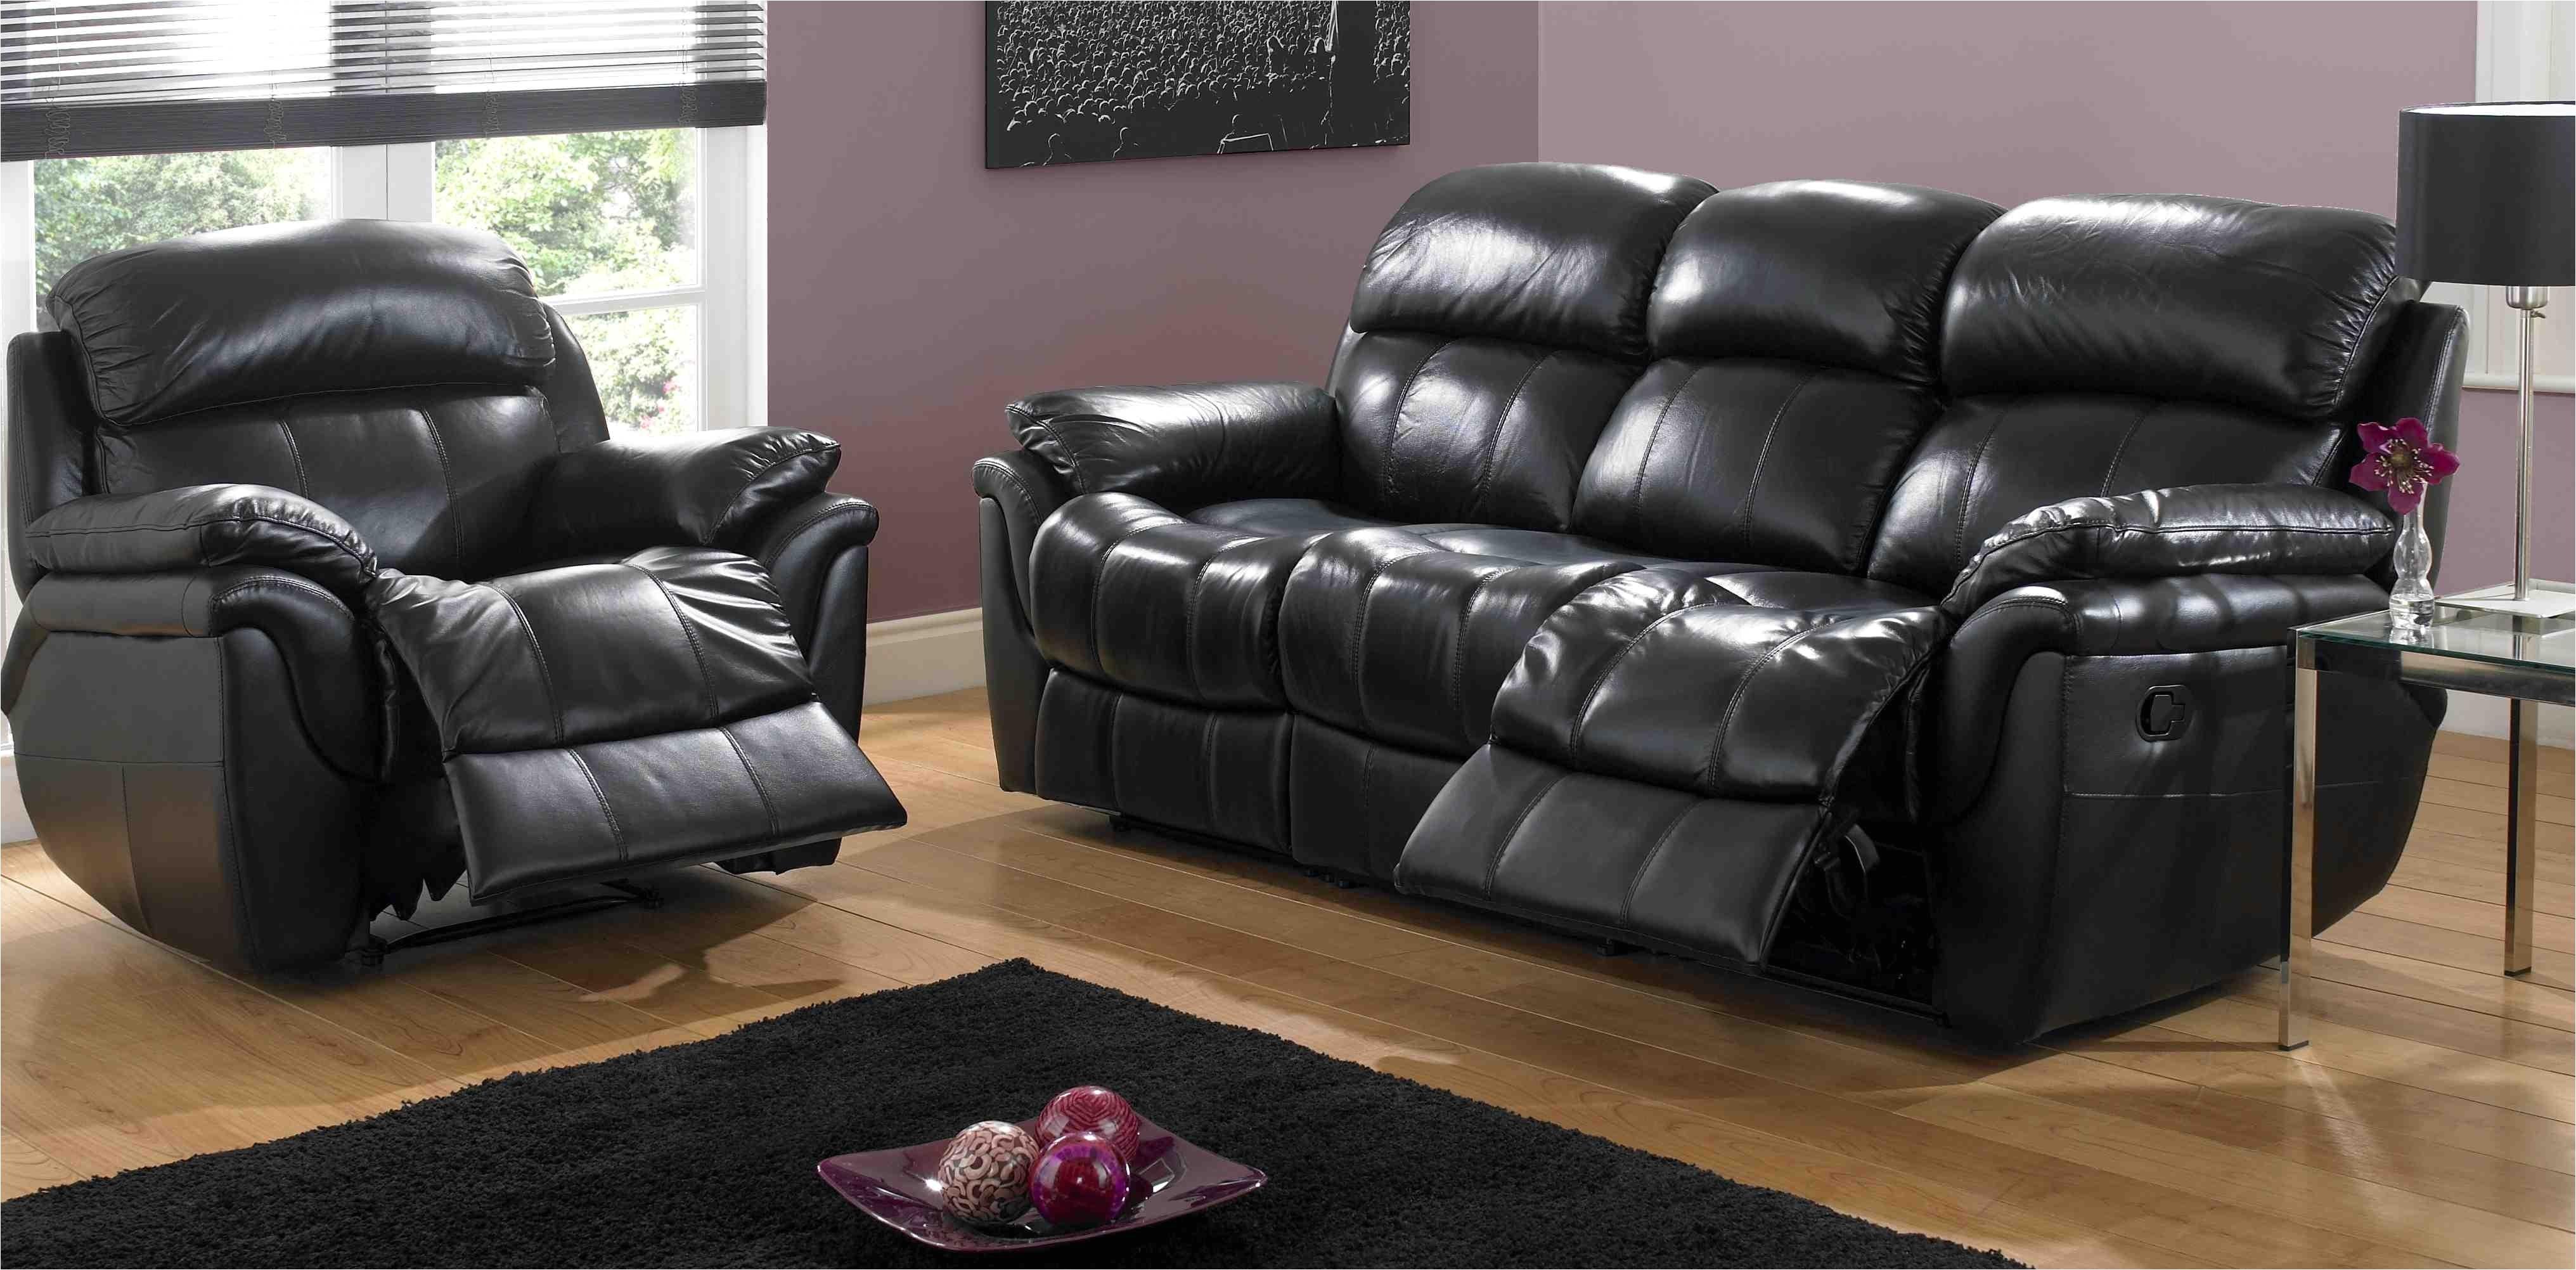 cool roxanne sofa macys amazing home design best under ideass ideas 5 69y home design the